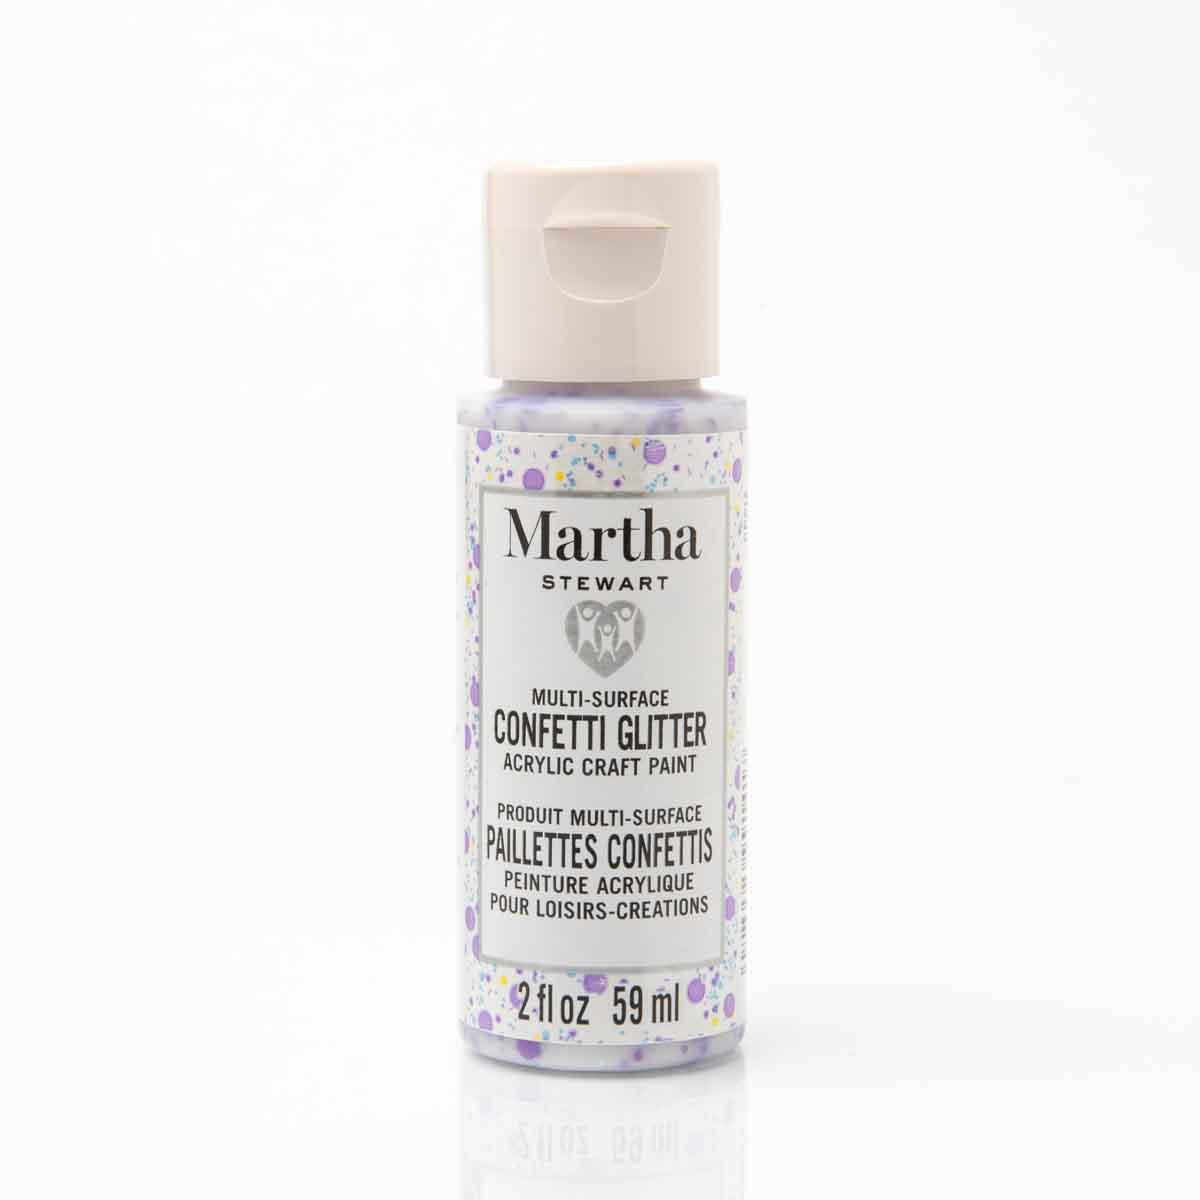 Martha Stewart ® Family Friendly Multi-Surface Confetti Glitter Acrylic Craft Paint 6-Color Set - MS